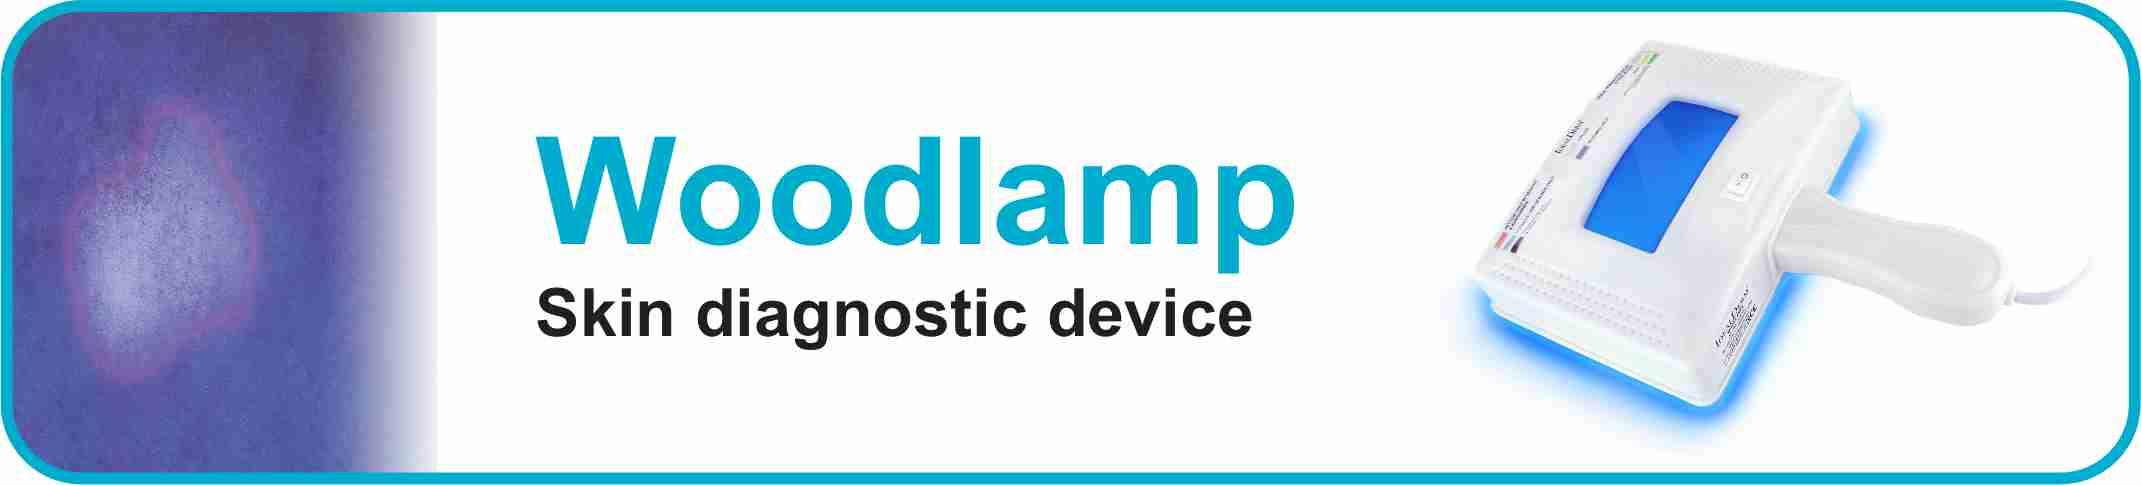 woodlamp-catalogs